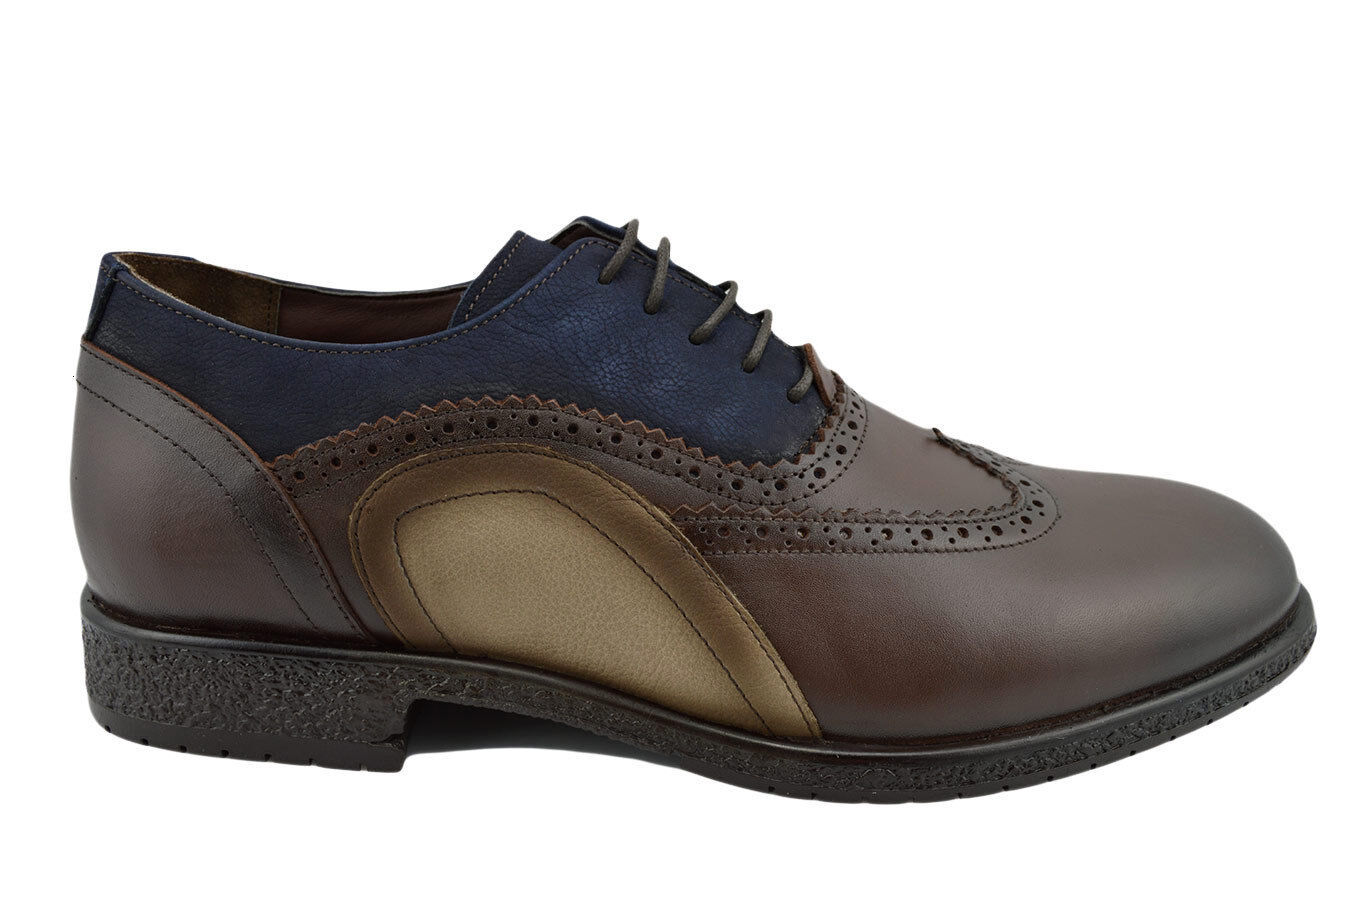 230 OVATTO OVATTO OVATTO braun Blau Leather WINGTIP Oxfords Dress Men schuhe NEW COLLECTION 27890f